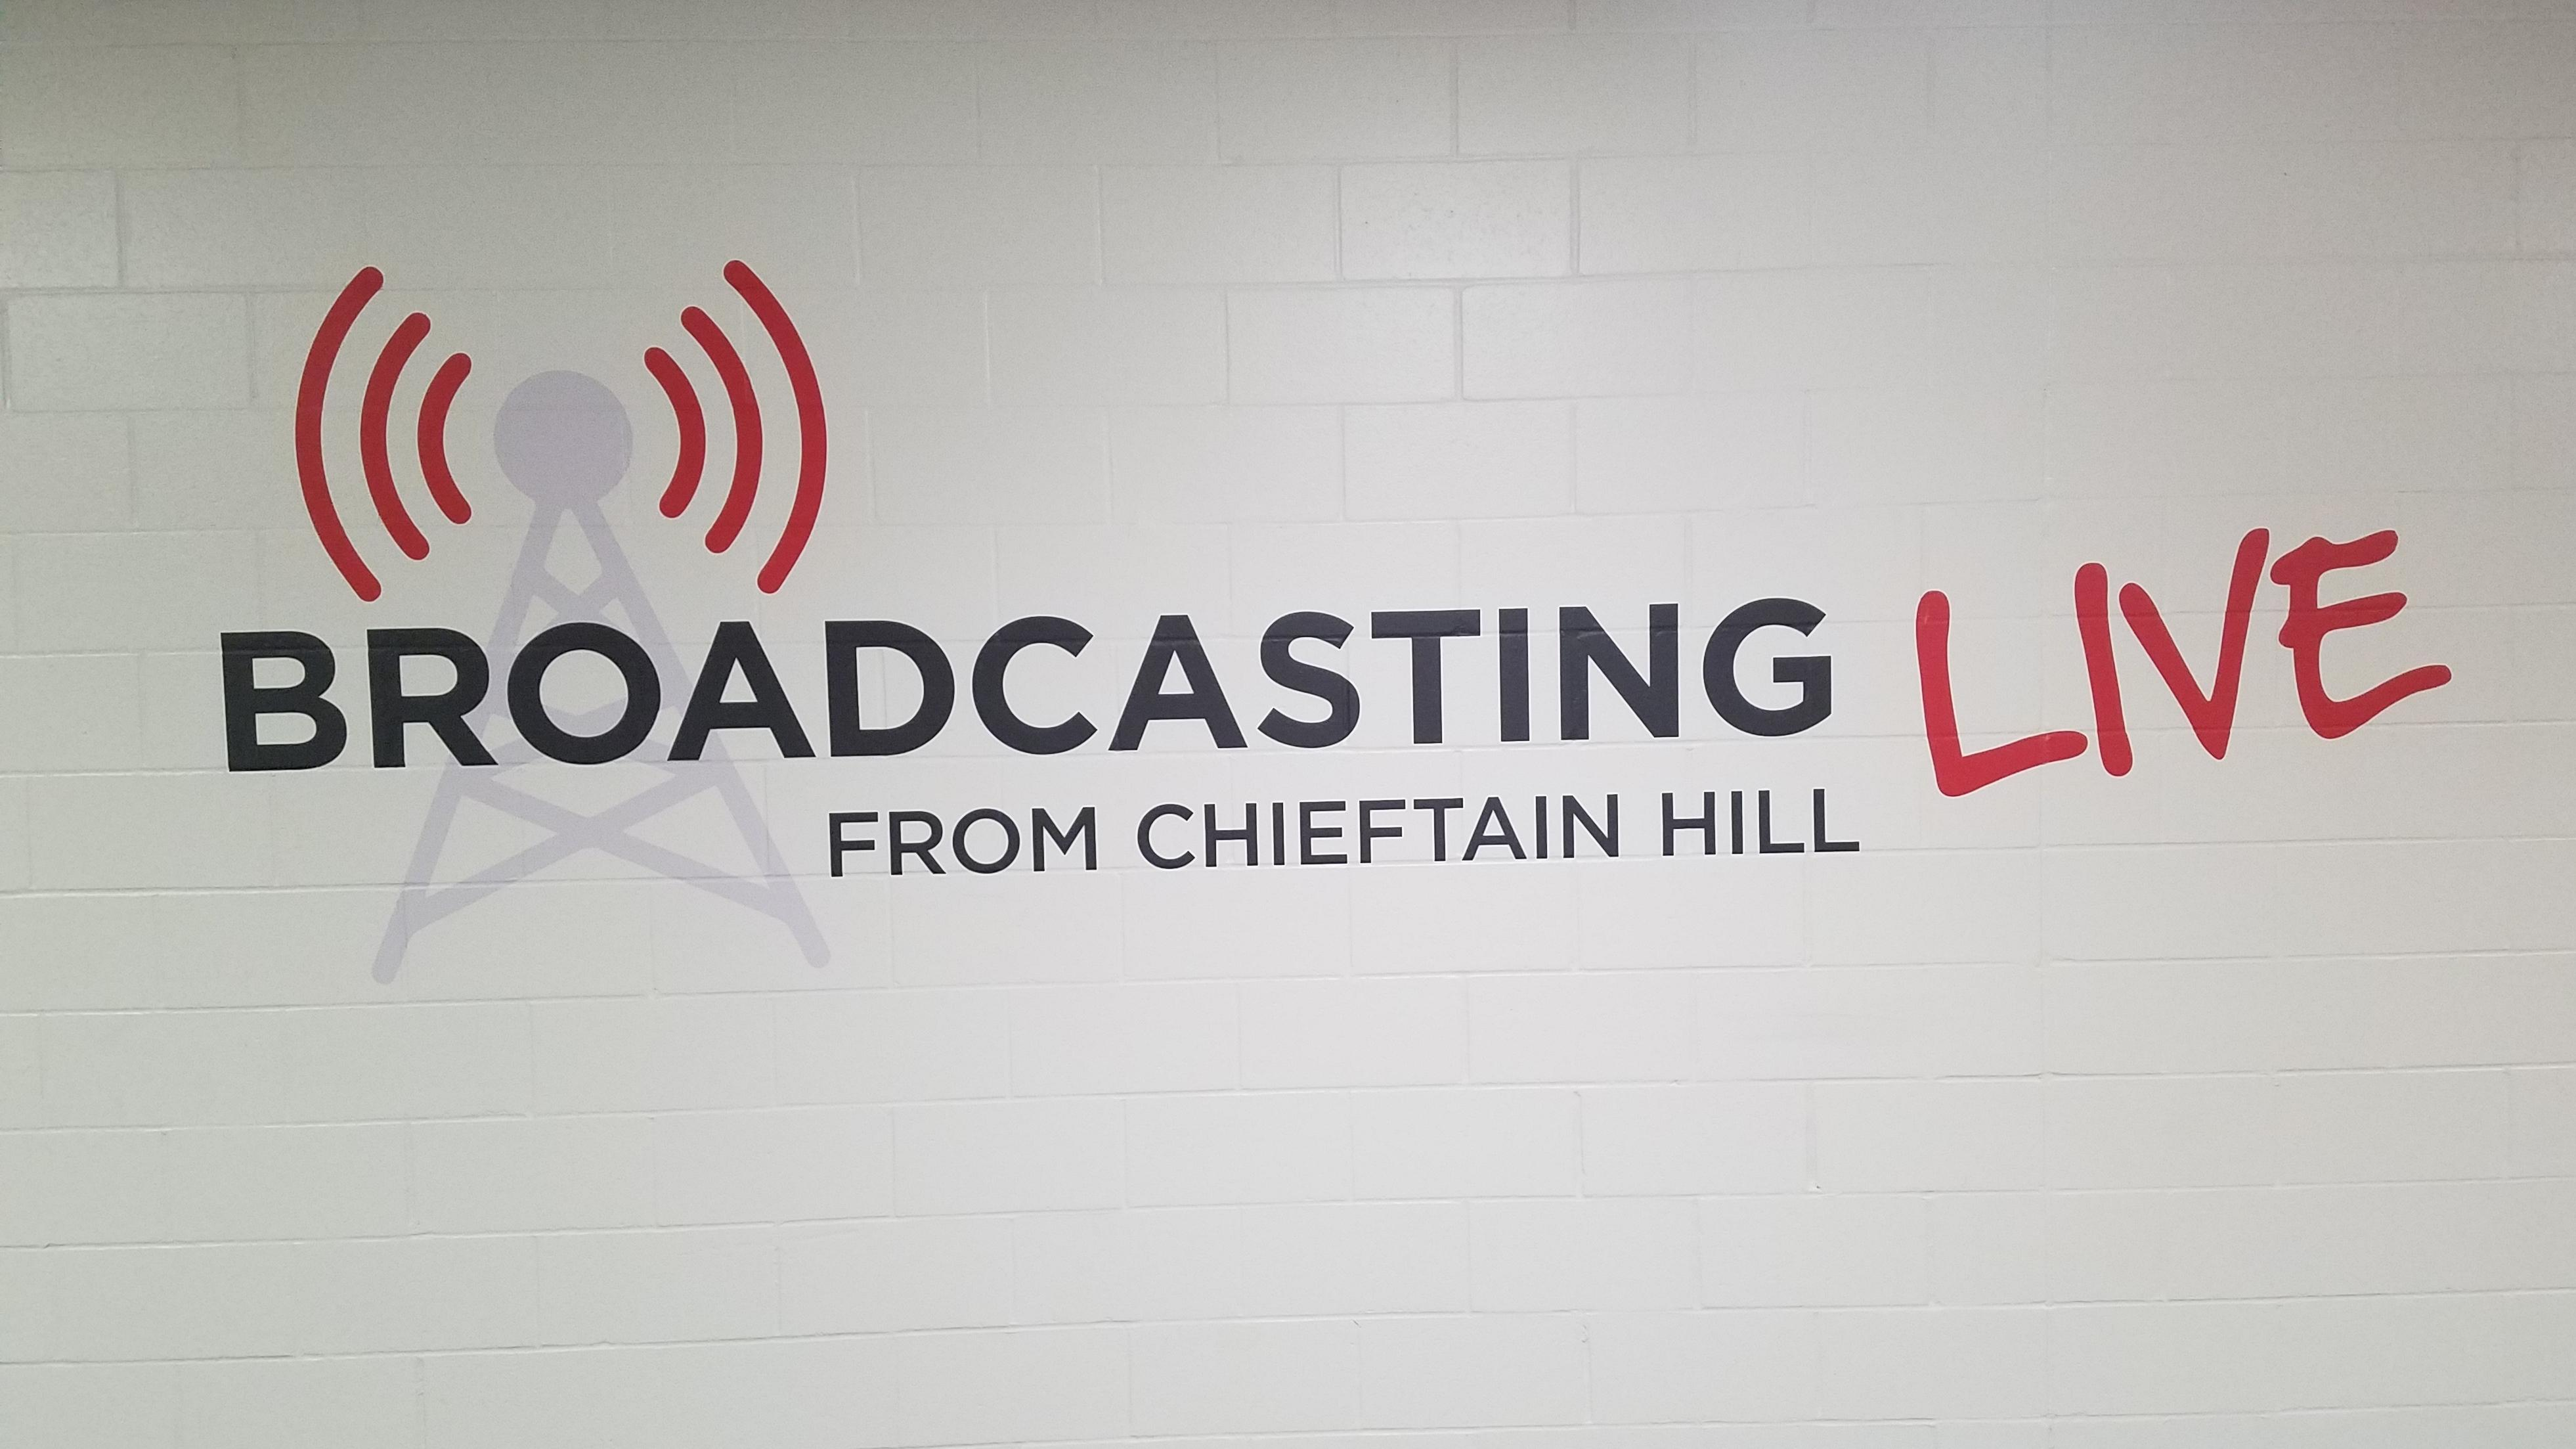 Chief's Media